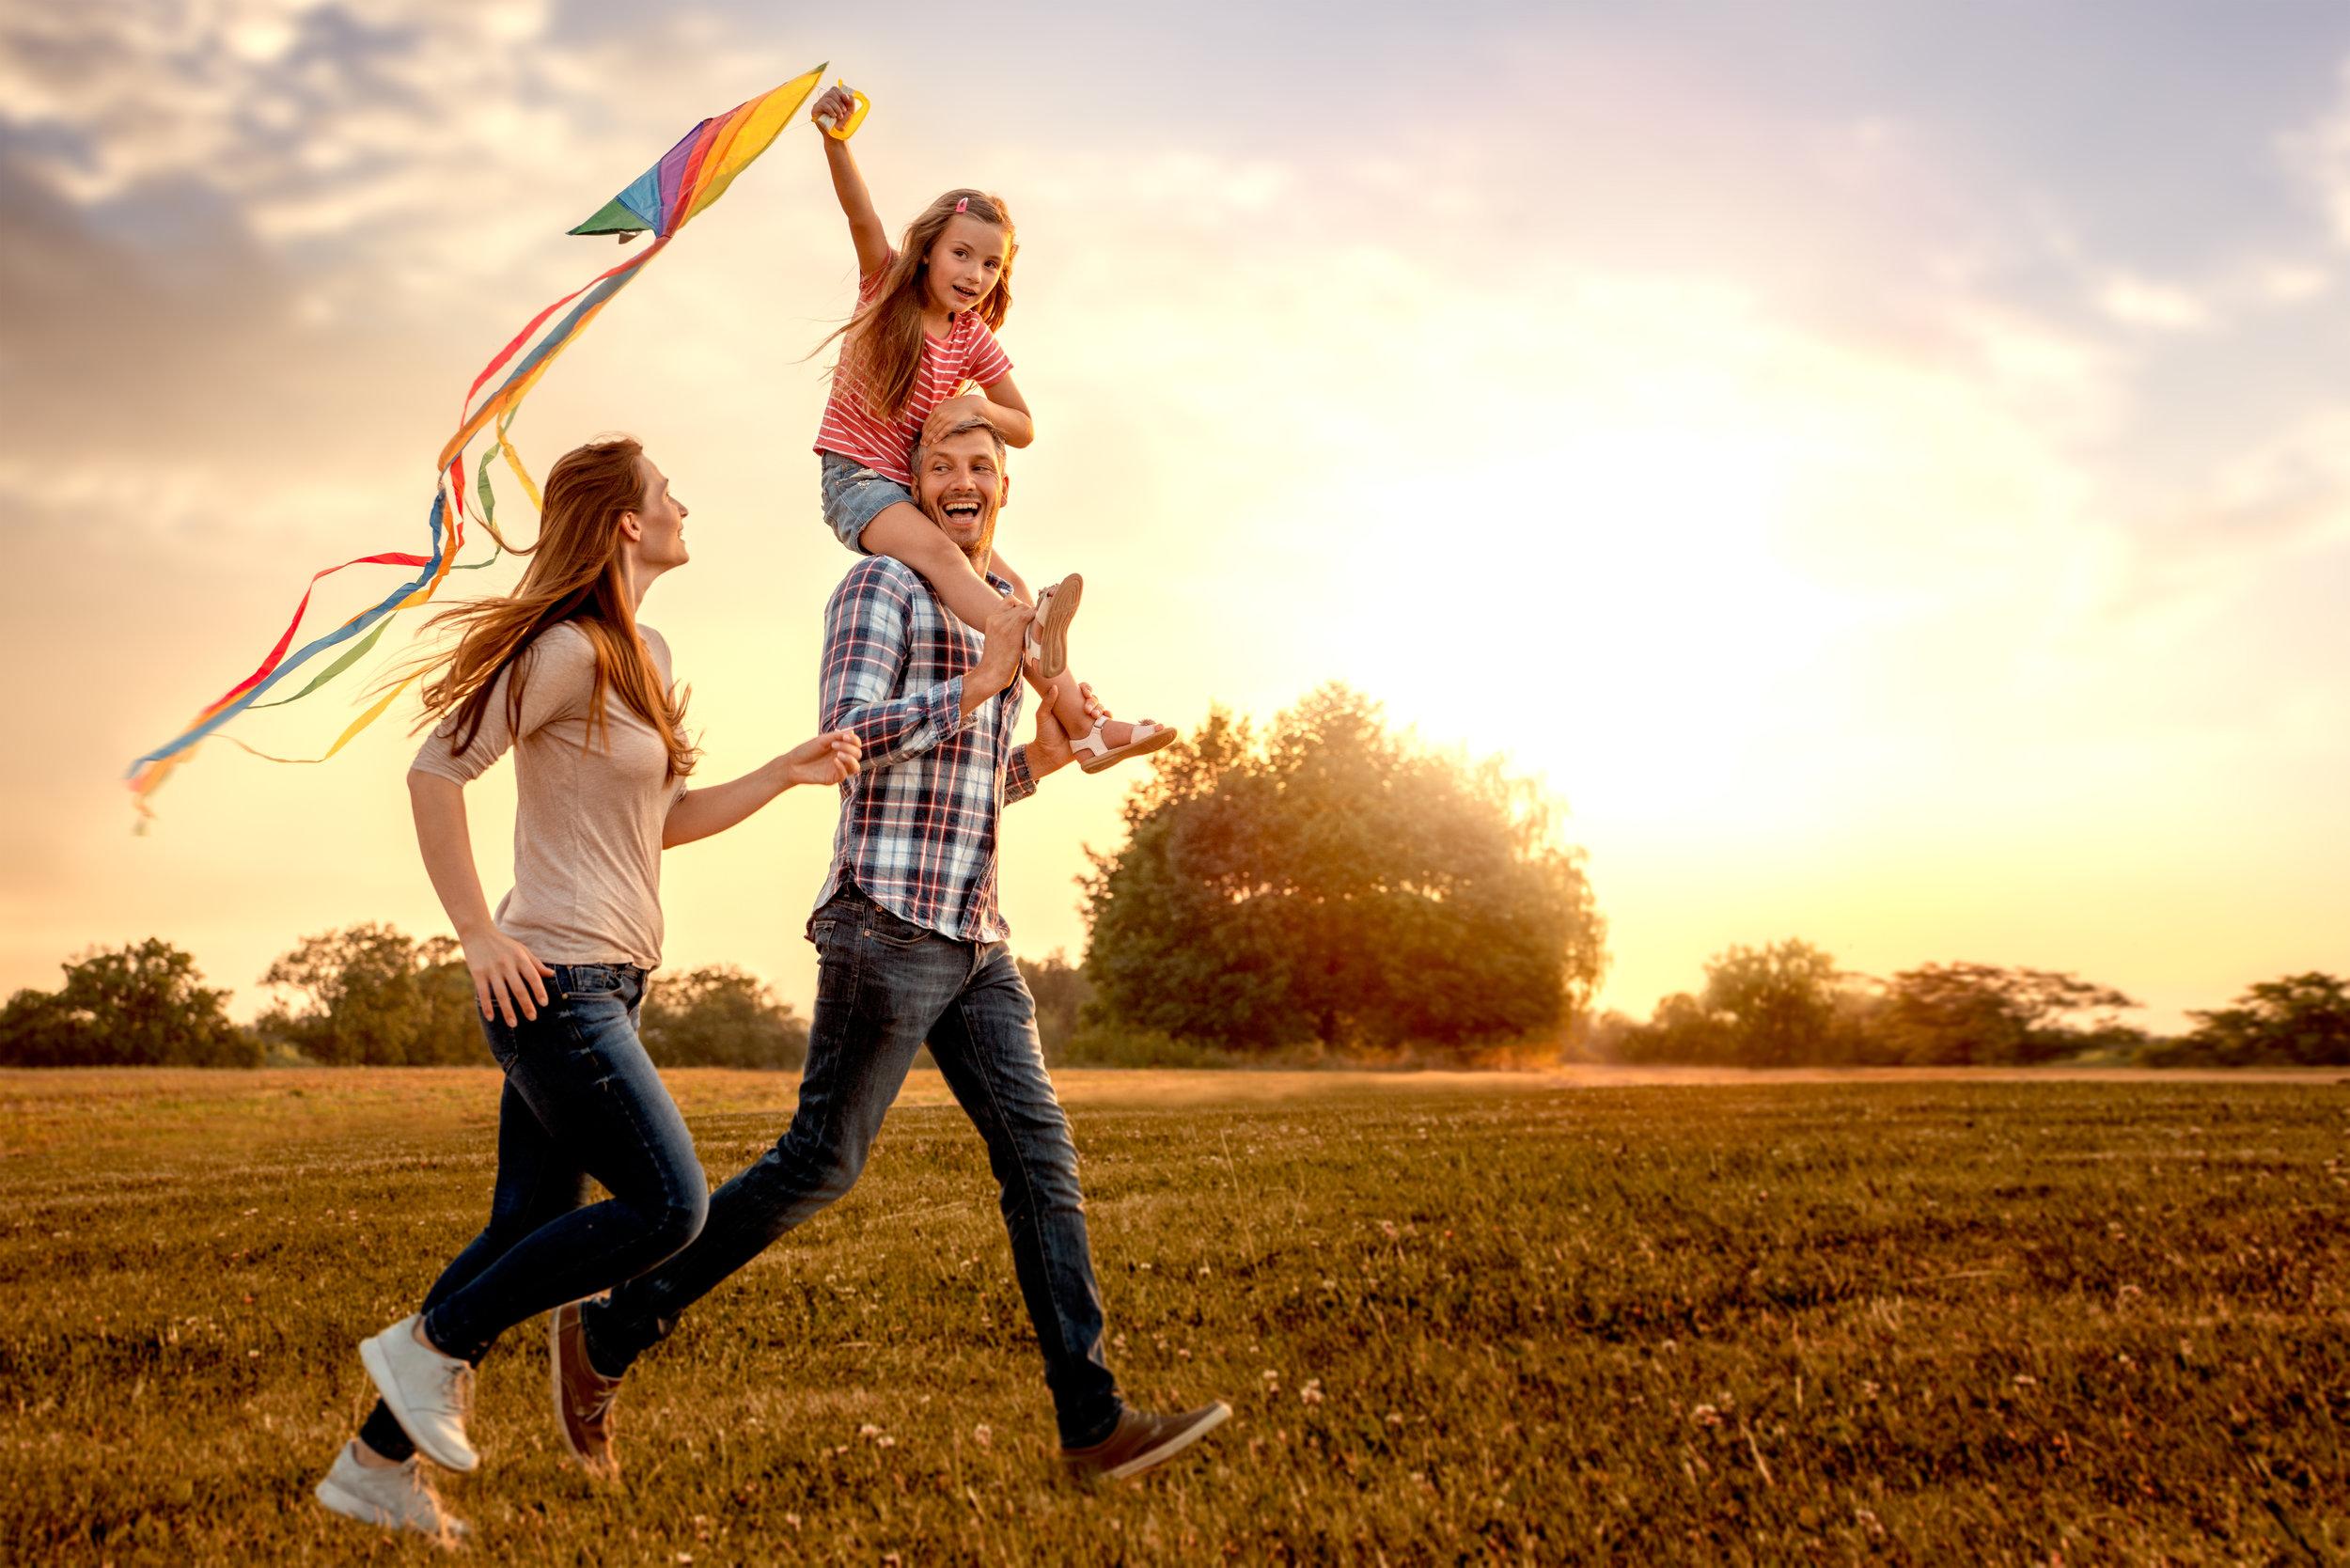 carefree-family-PS5T8DE.jpg